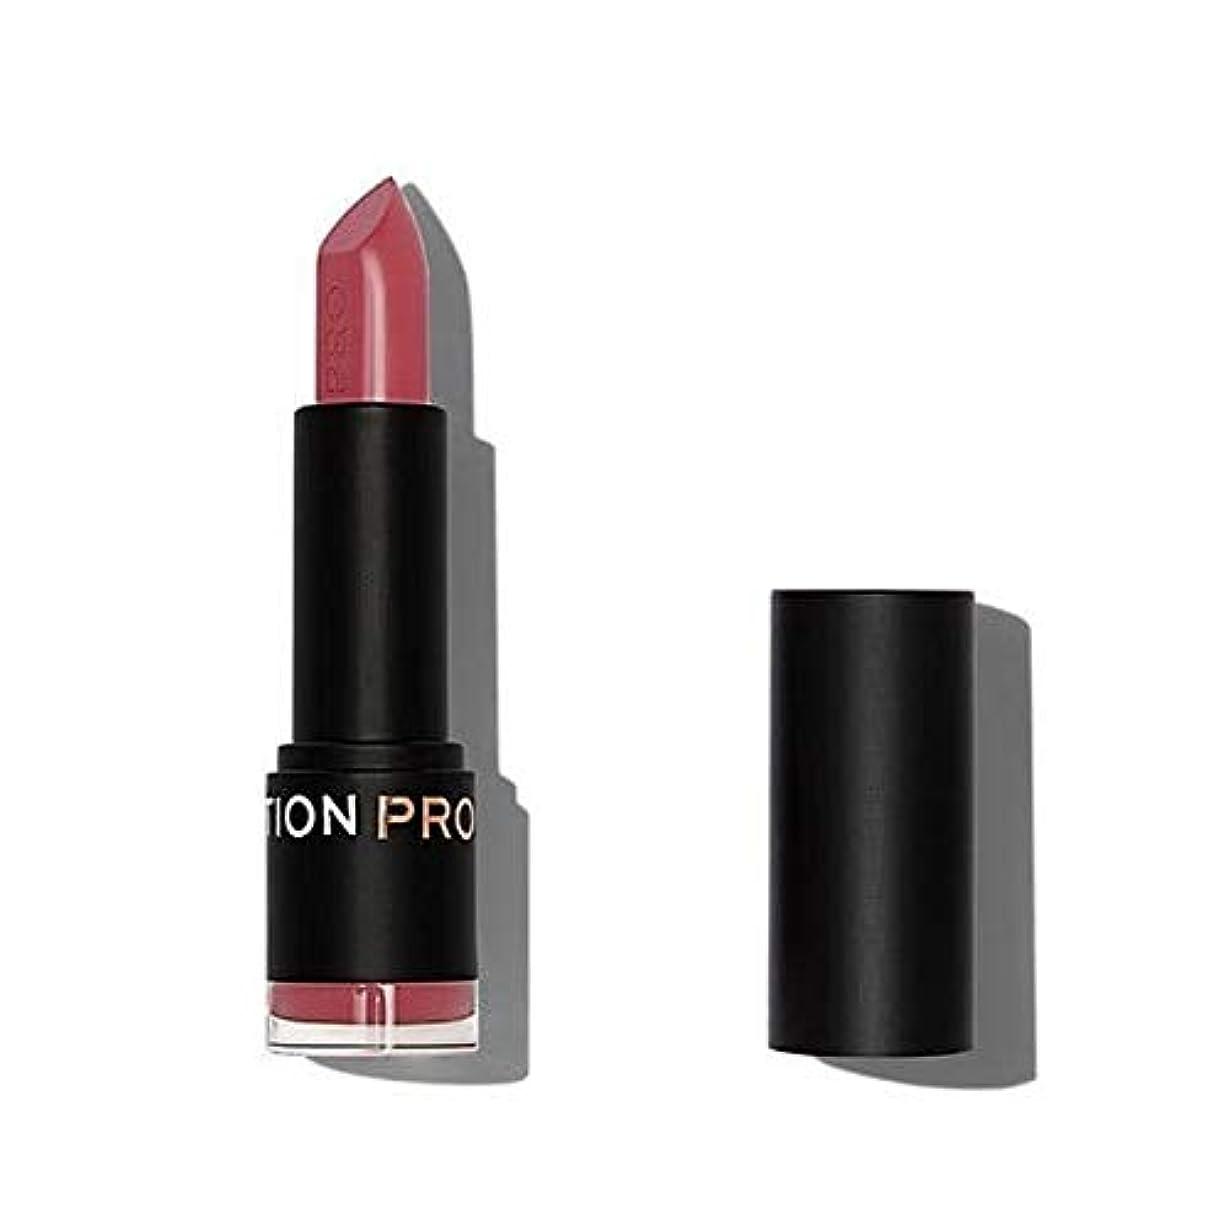 [Revolution ] 革命プロ最高の口紅の意向 - Revolution Pro Supreme Lipstick Intention [並行輸入品]